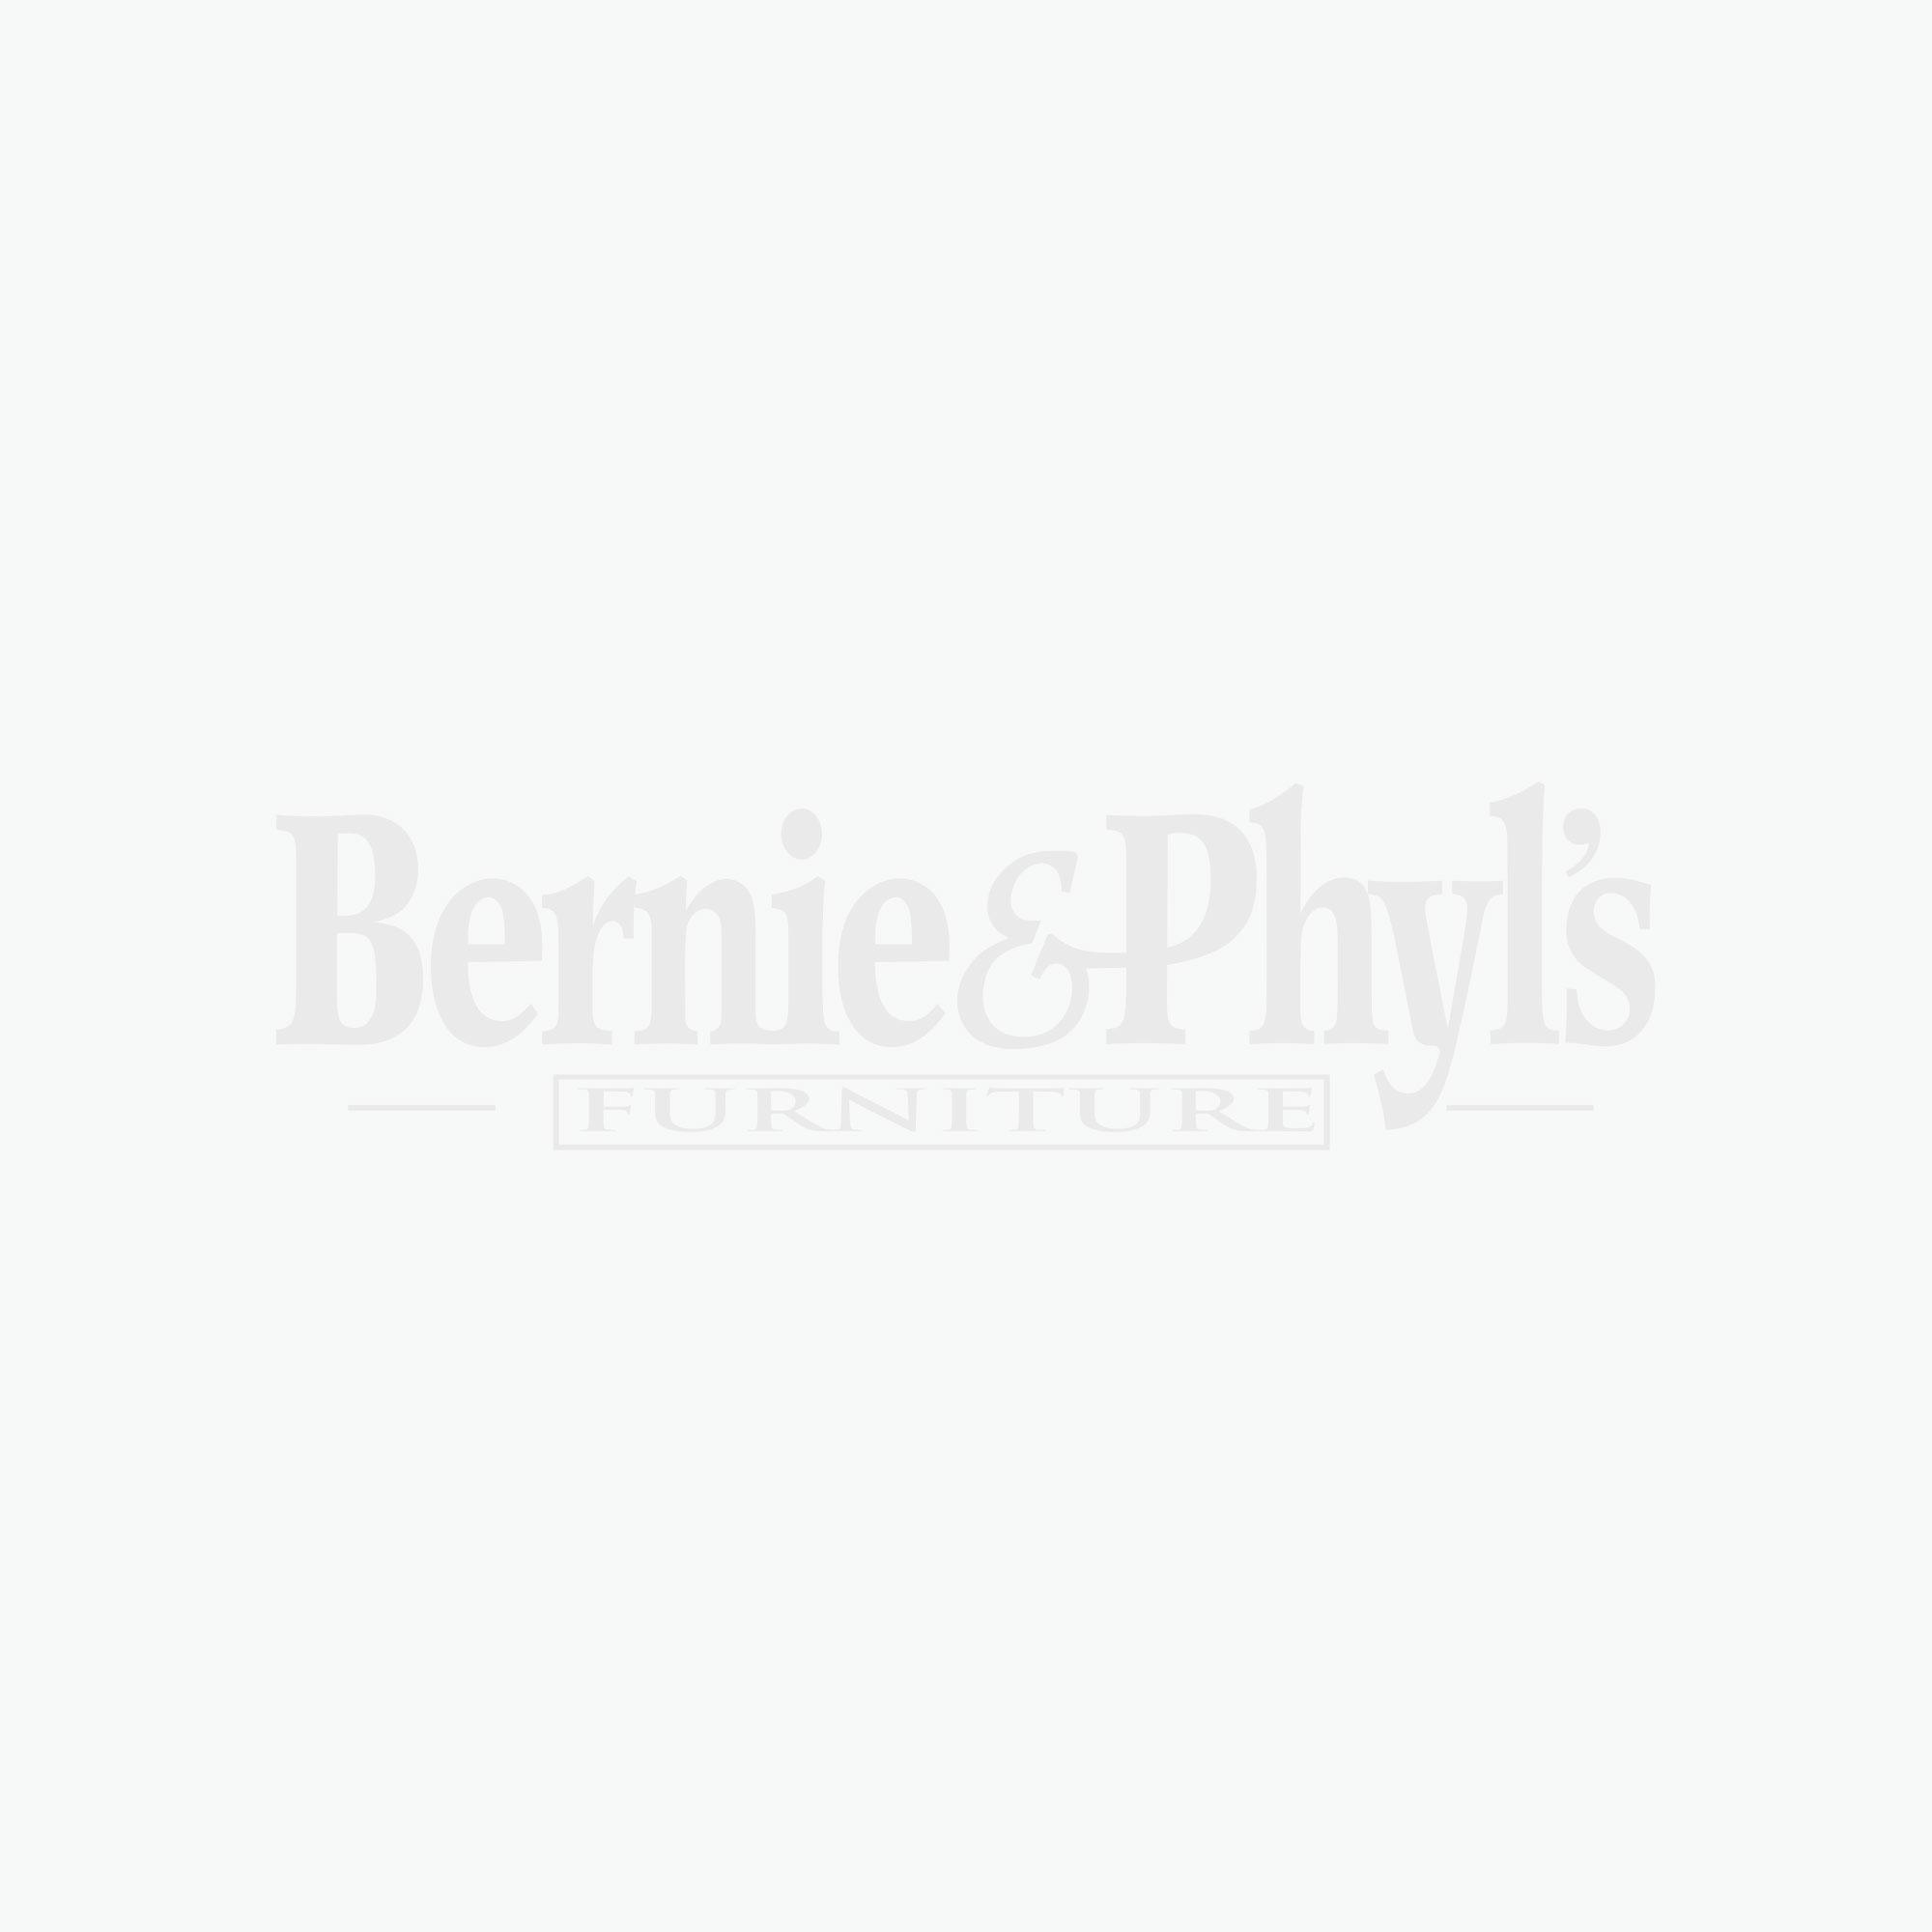 Bedroom Armoires | Bedroom Wardrobes - Bernie & Phyl\'s Furniture